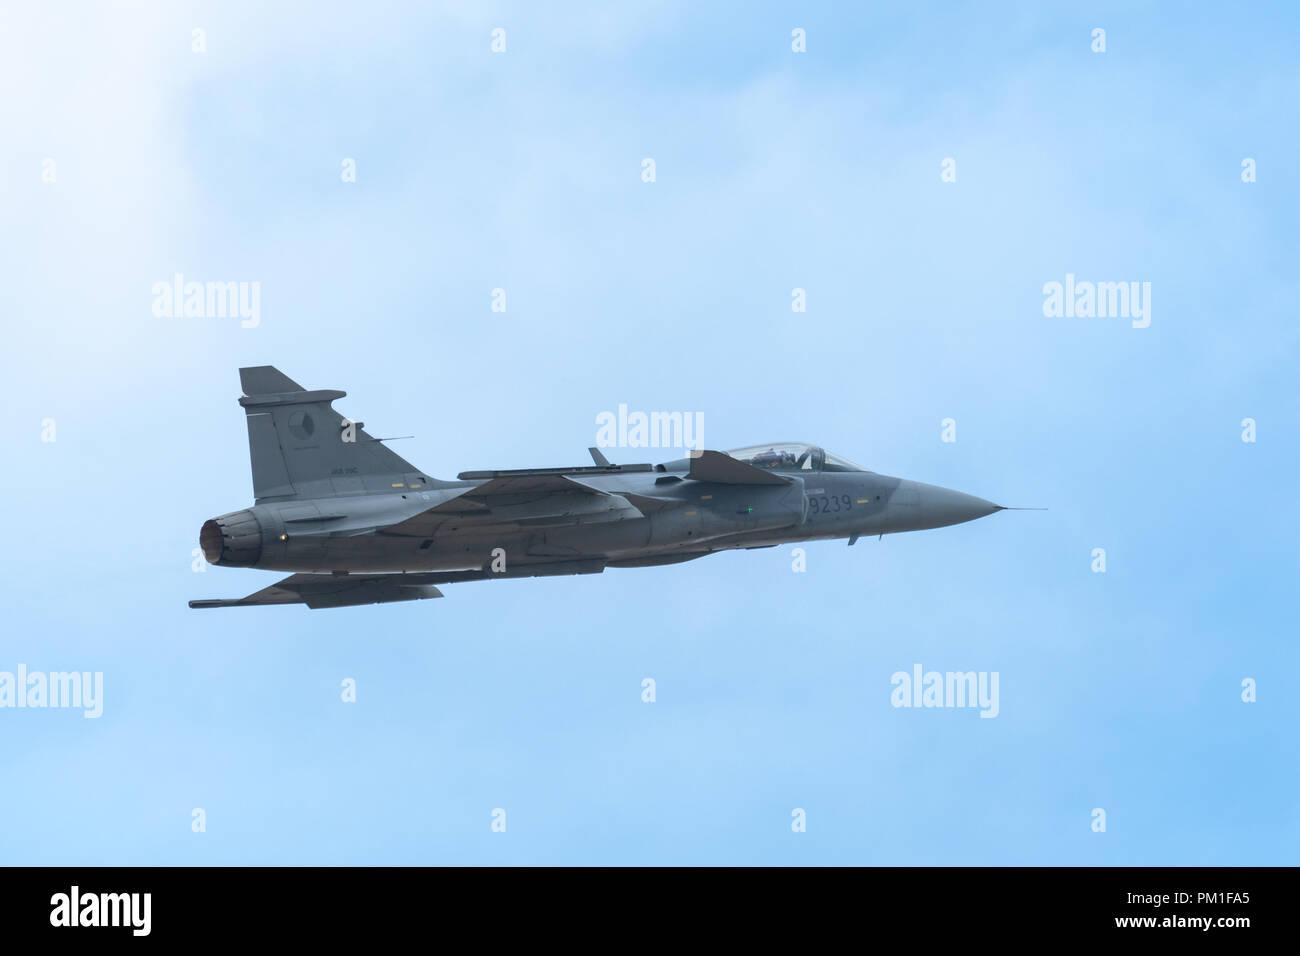 Blue Saab Stock Photos & Blue Saab Stock Images - Page 3 - Alamy